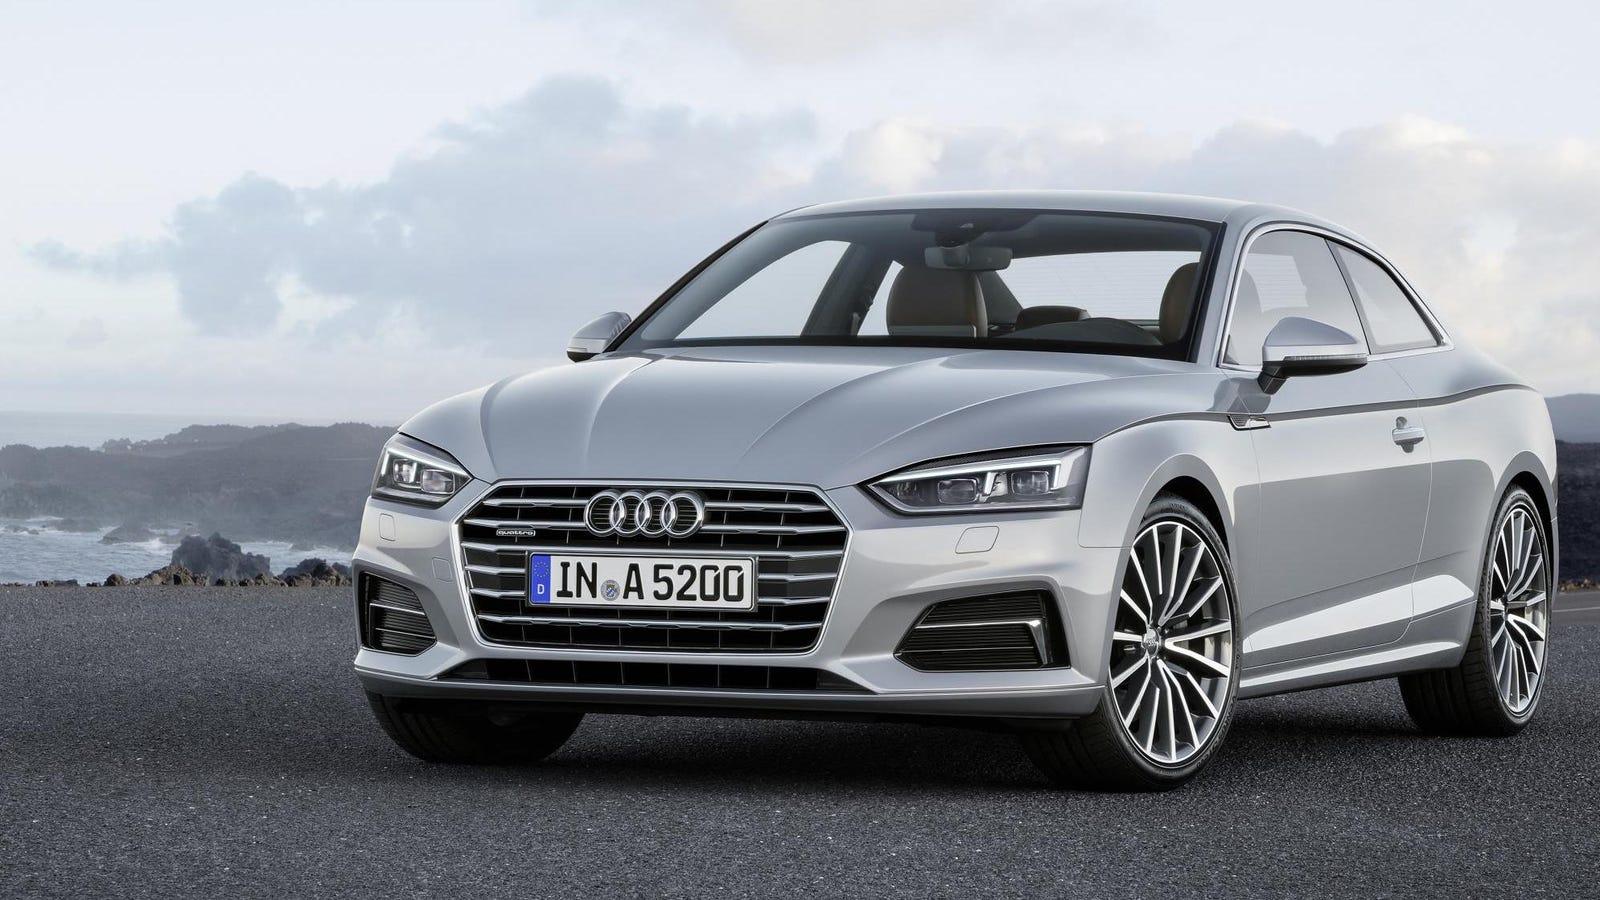 Audi S News Videos Reviews And Gossip Jalopnik - Audi dealer long island